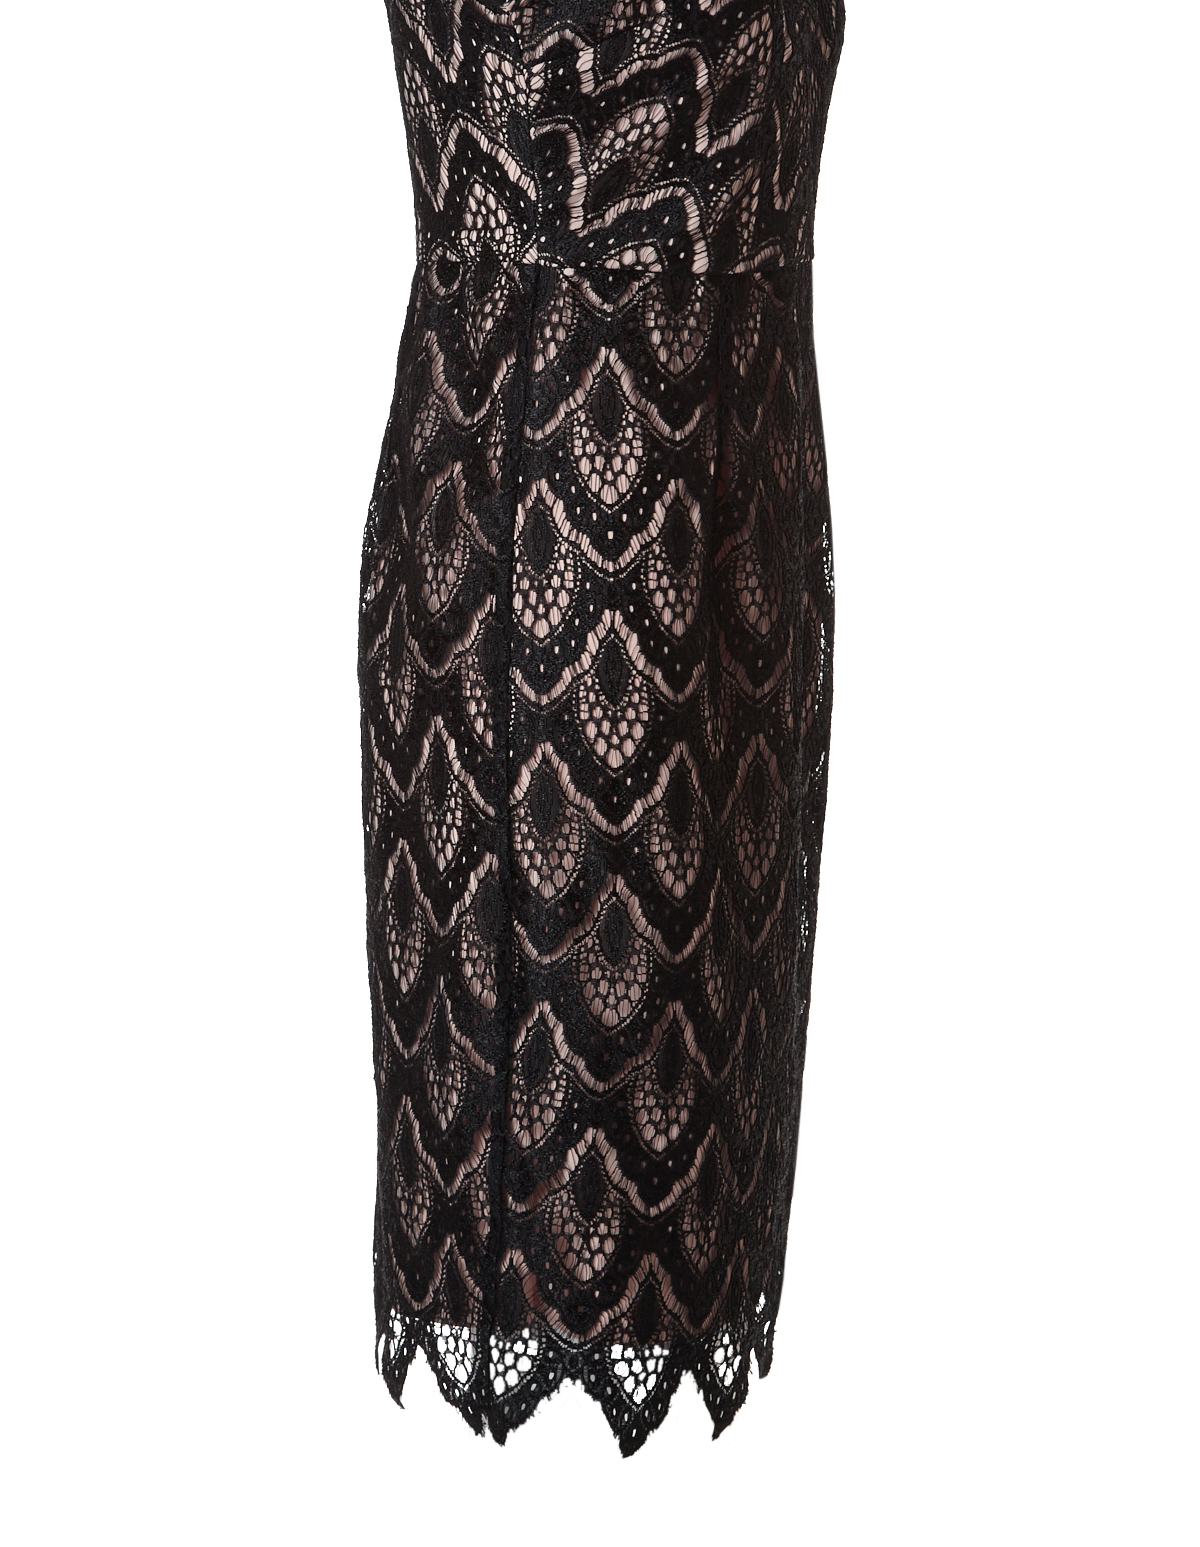 Illusion Neckline Black Lace Dress